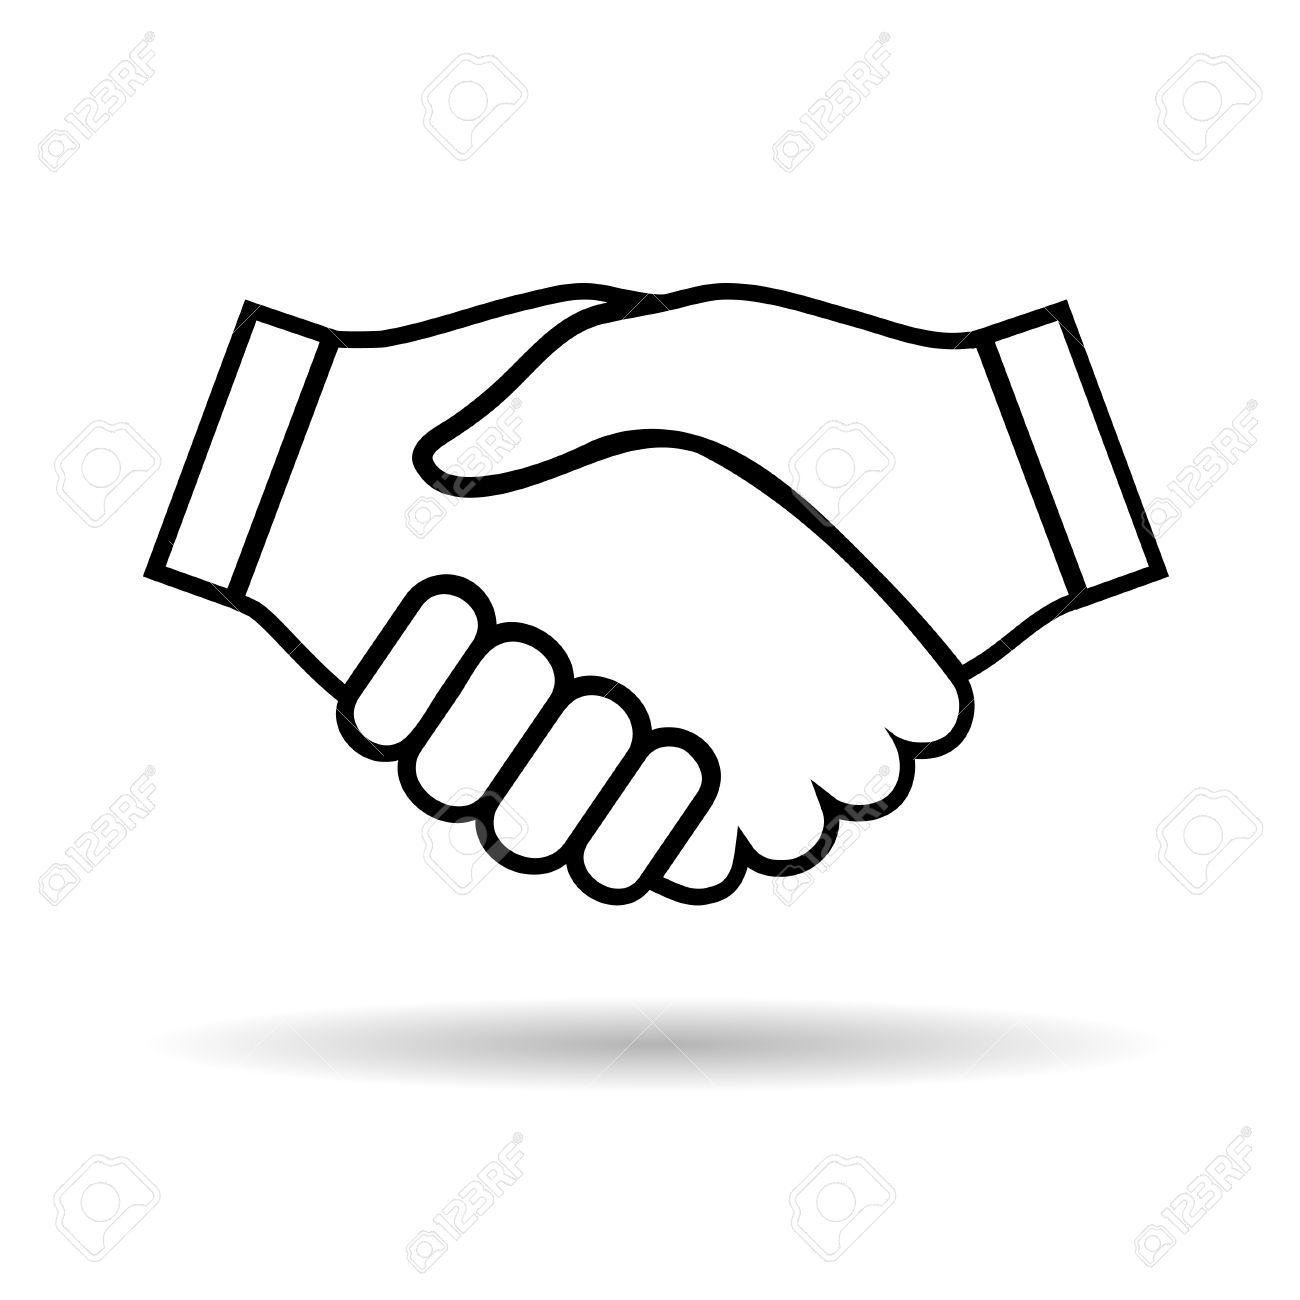 1300x1300 Fingers Handshake Clipart, Explore Pictures